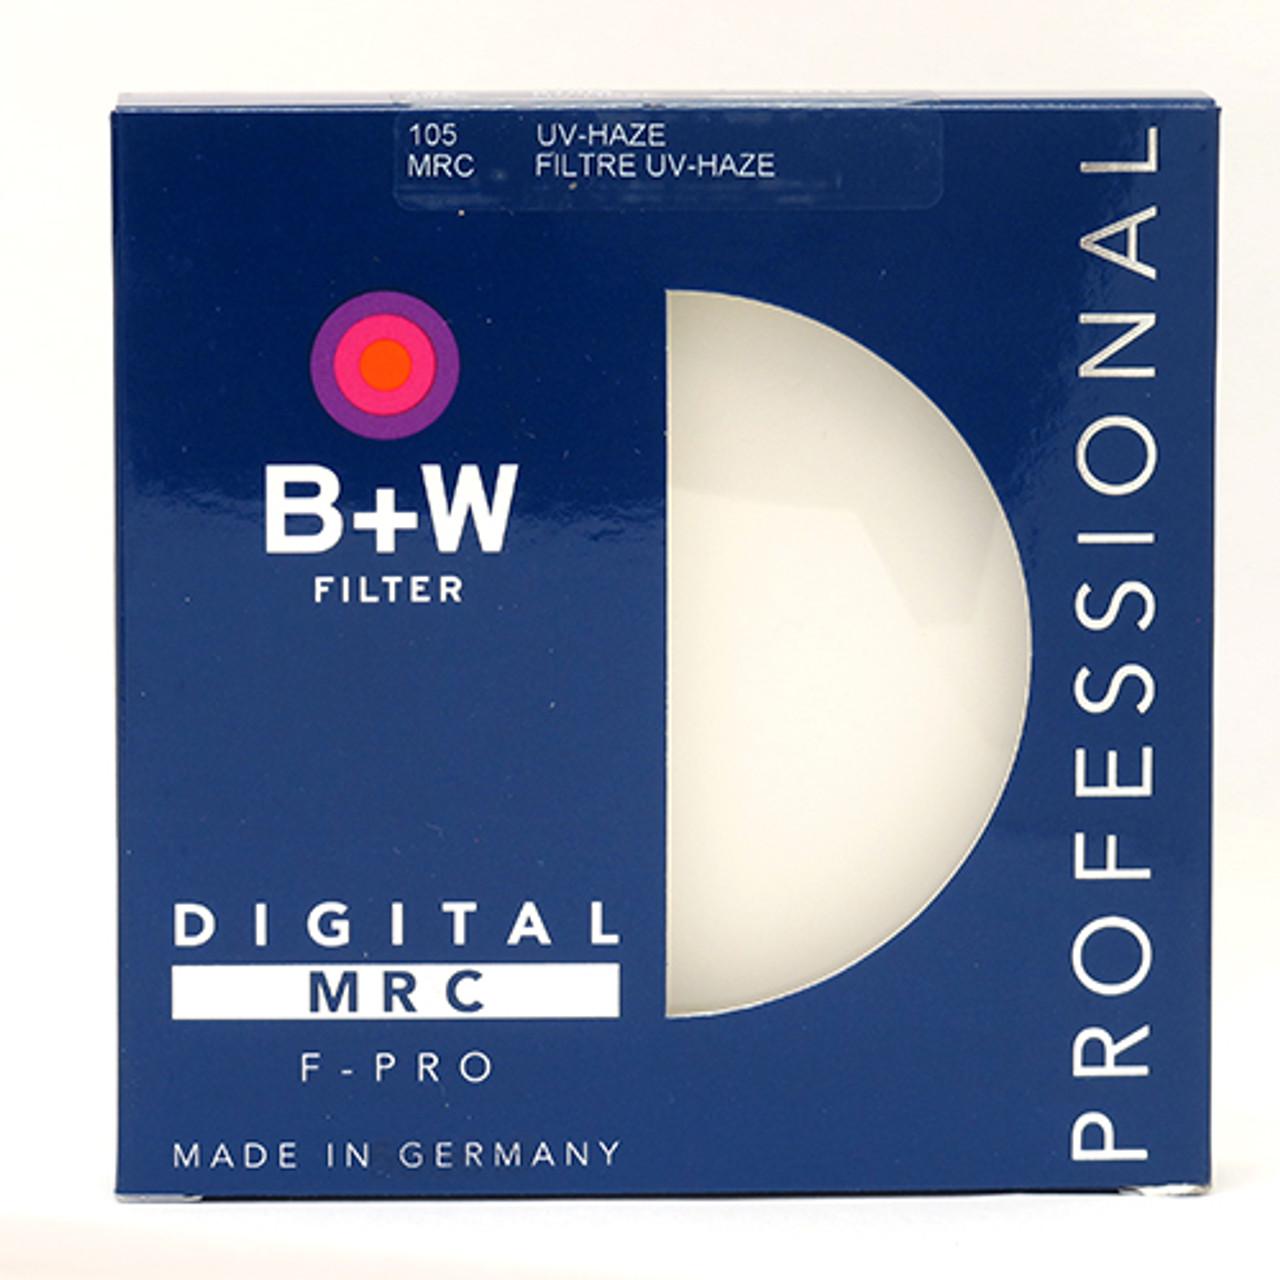 B+W UV HAZE MRC (010)(105MM)